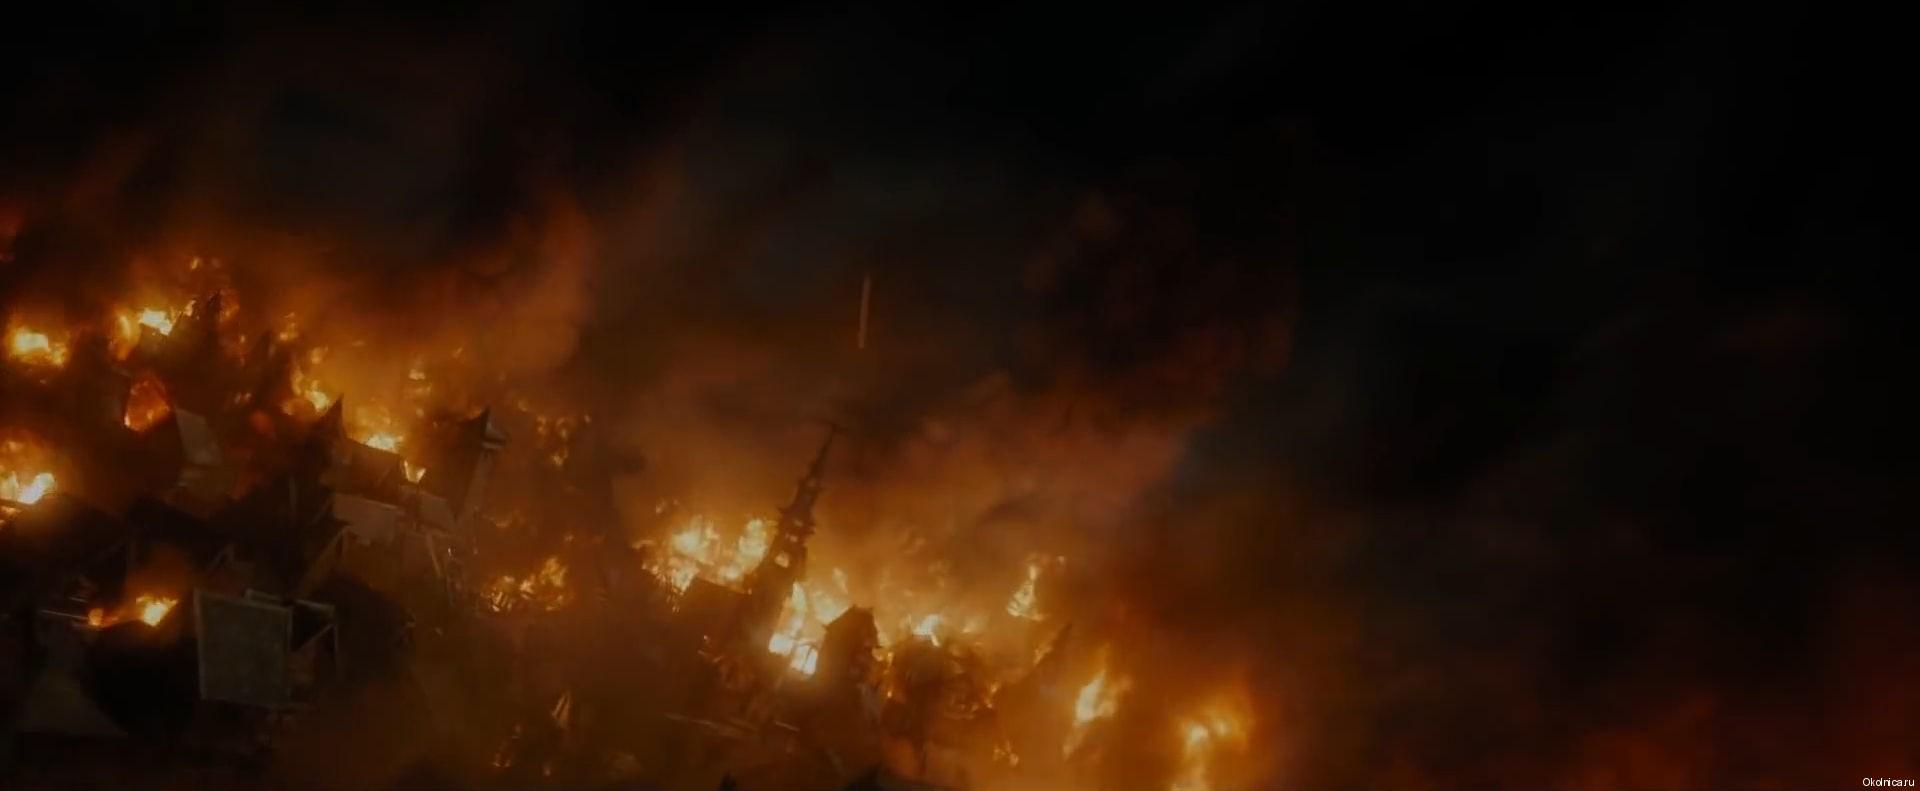 Kino_Hobbit_Bitva_pyati_voinstv_05